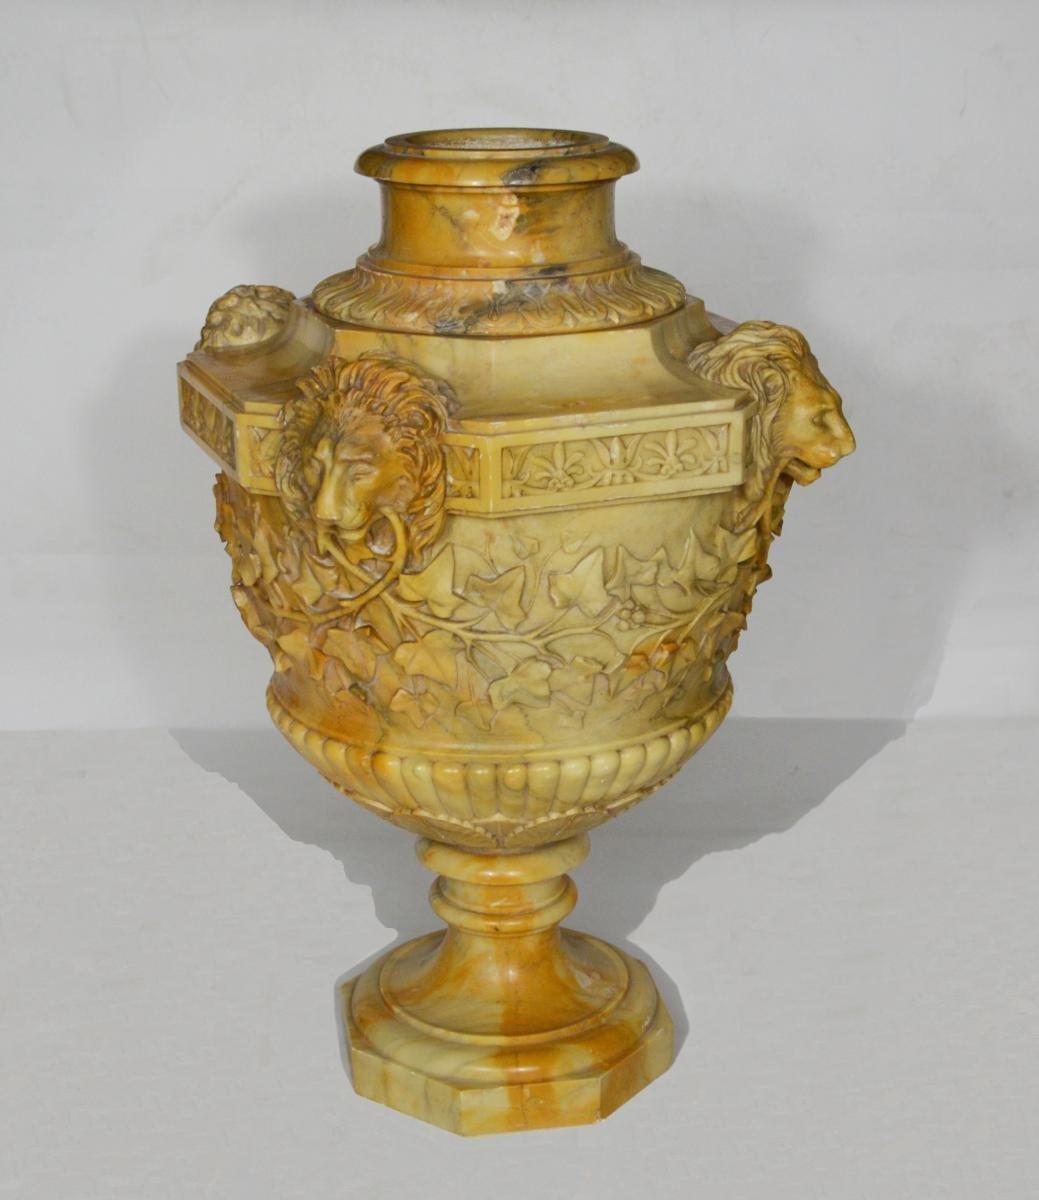 vase en marbre attribu benedetto boschetti xixe si cle. Black Bedroom Furniture Sets. Home Design Ideas